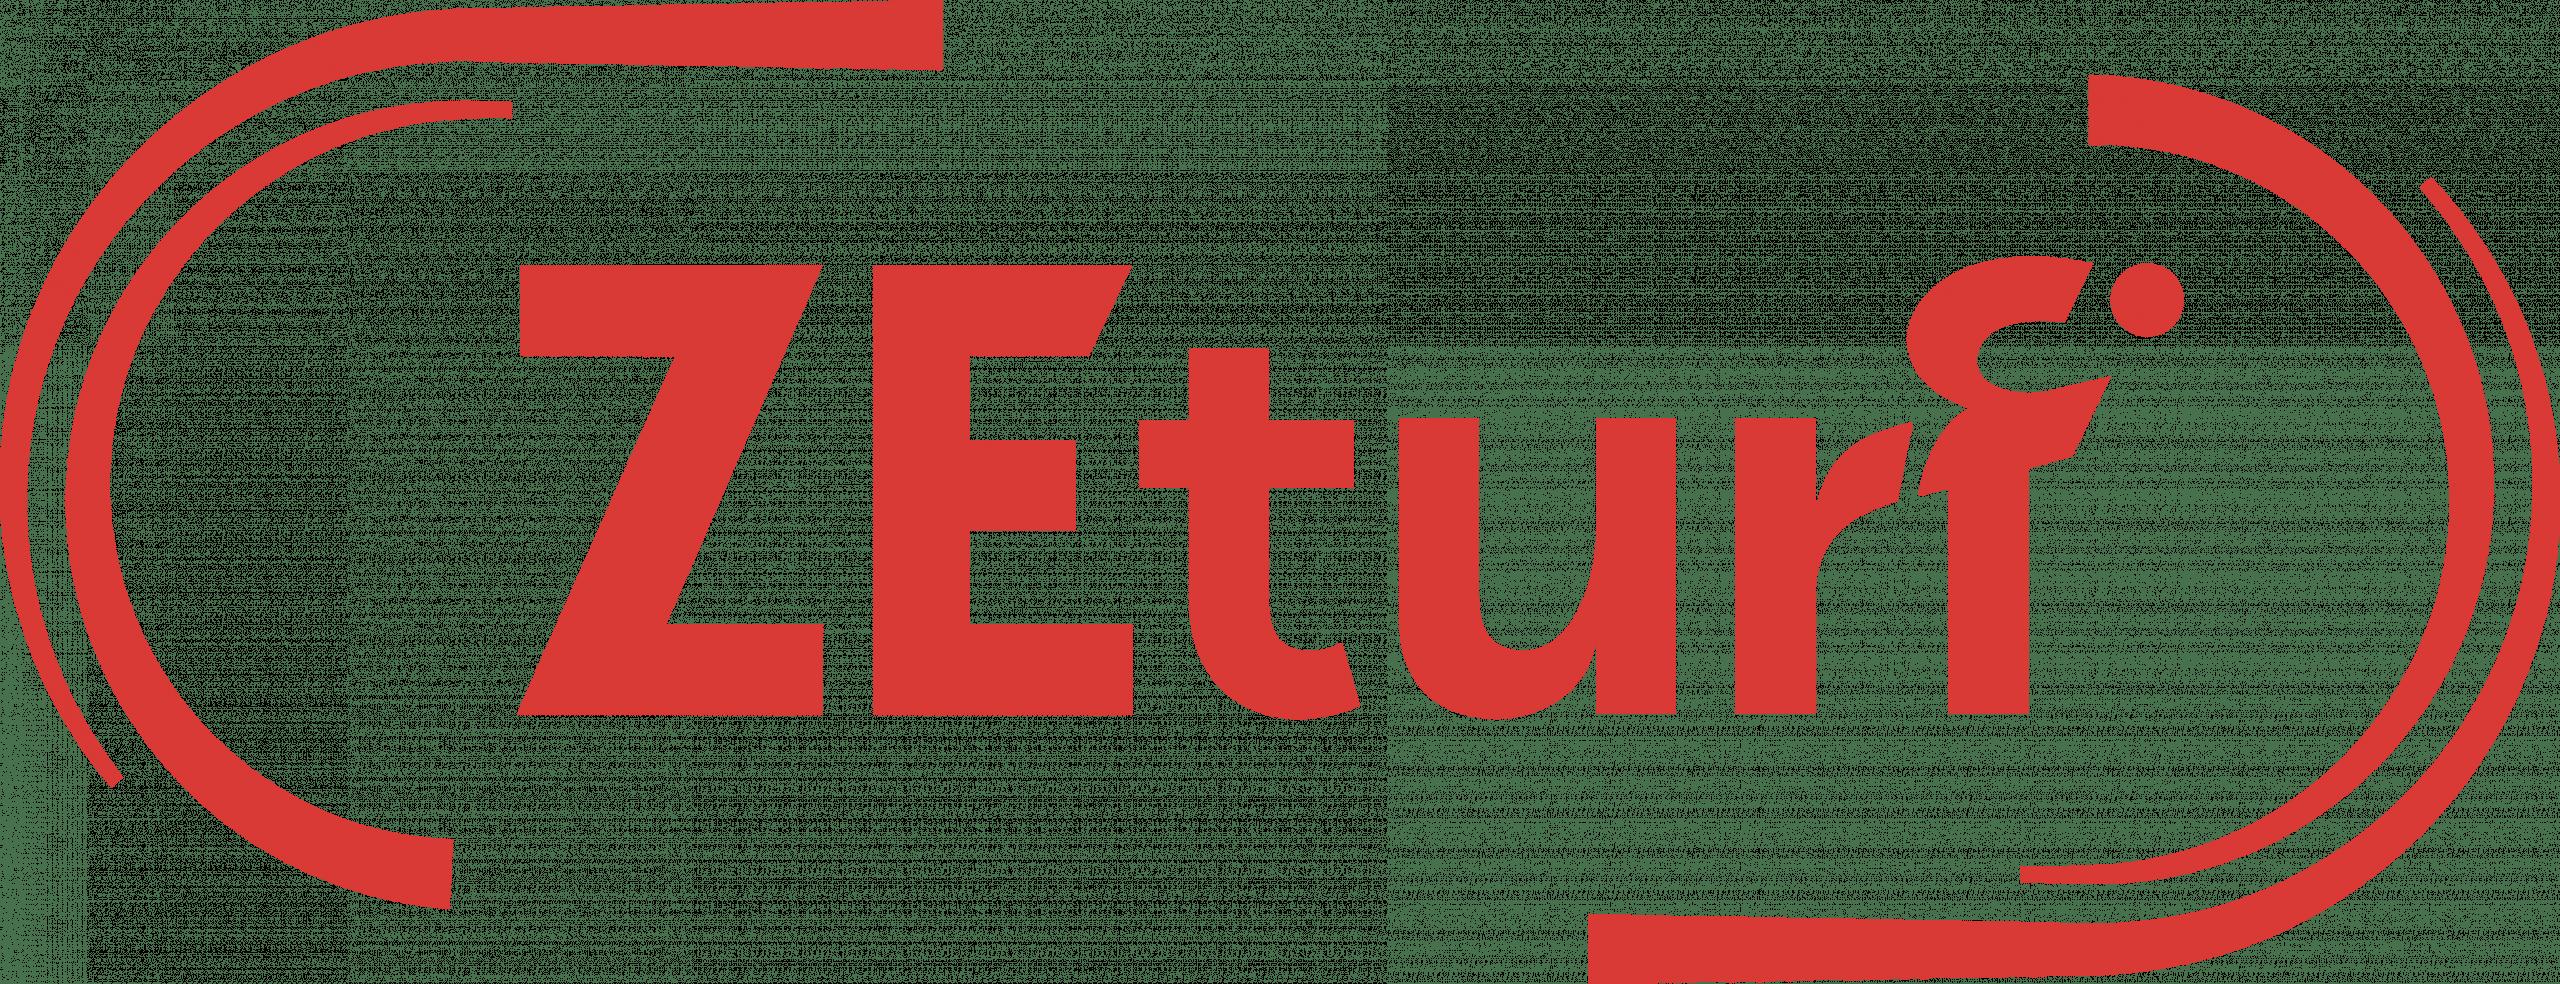 ZEturf logo via CasinoNieuws.nl